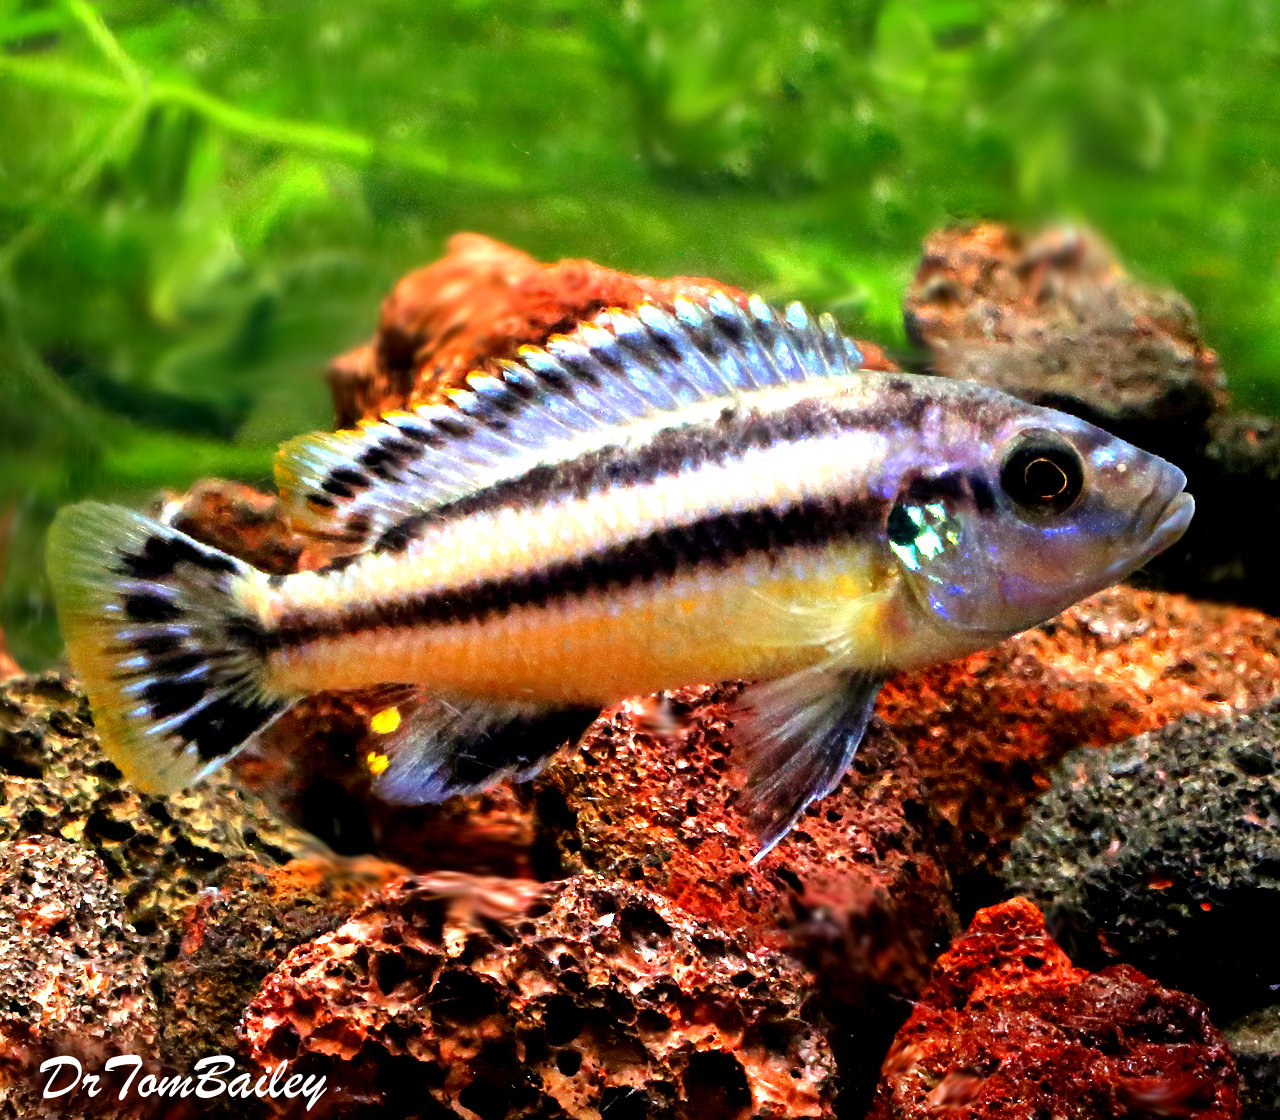 BABY Melanochromis Chipokae Mbuna Cichlid, from Lake Malawi, born here